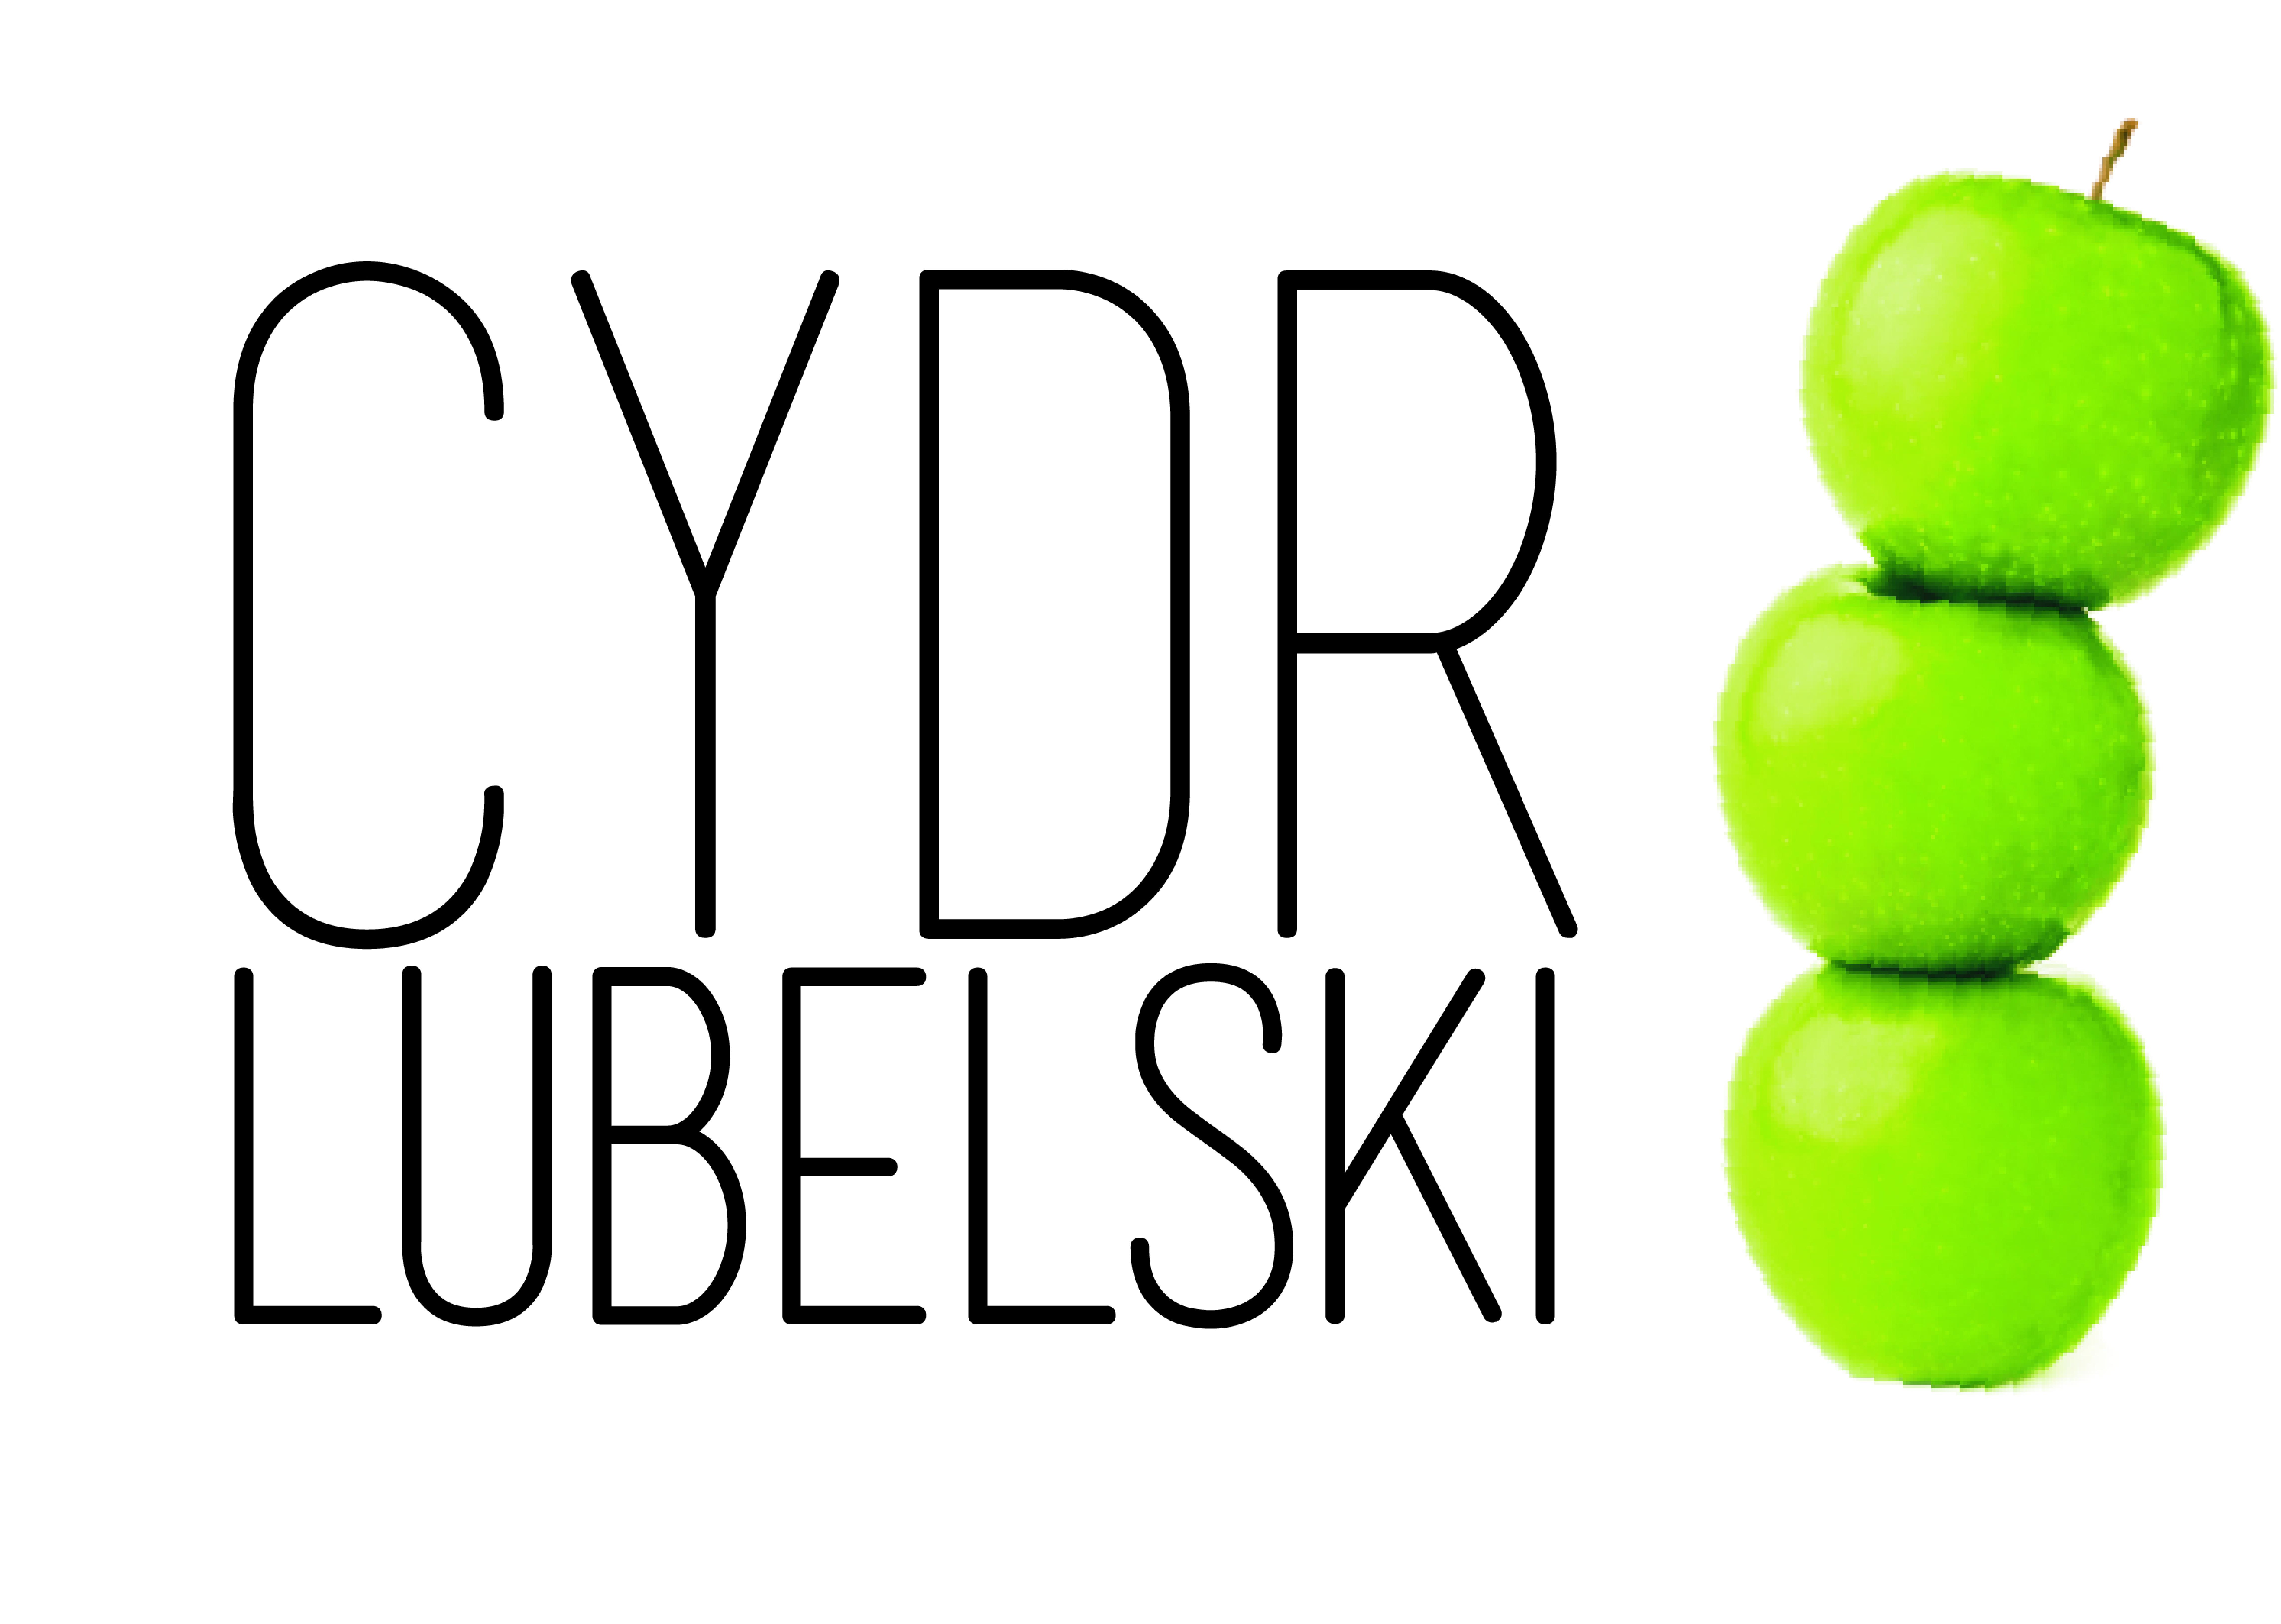 Logo Cydr Lubelski